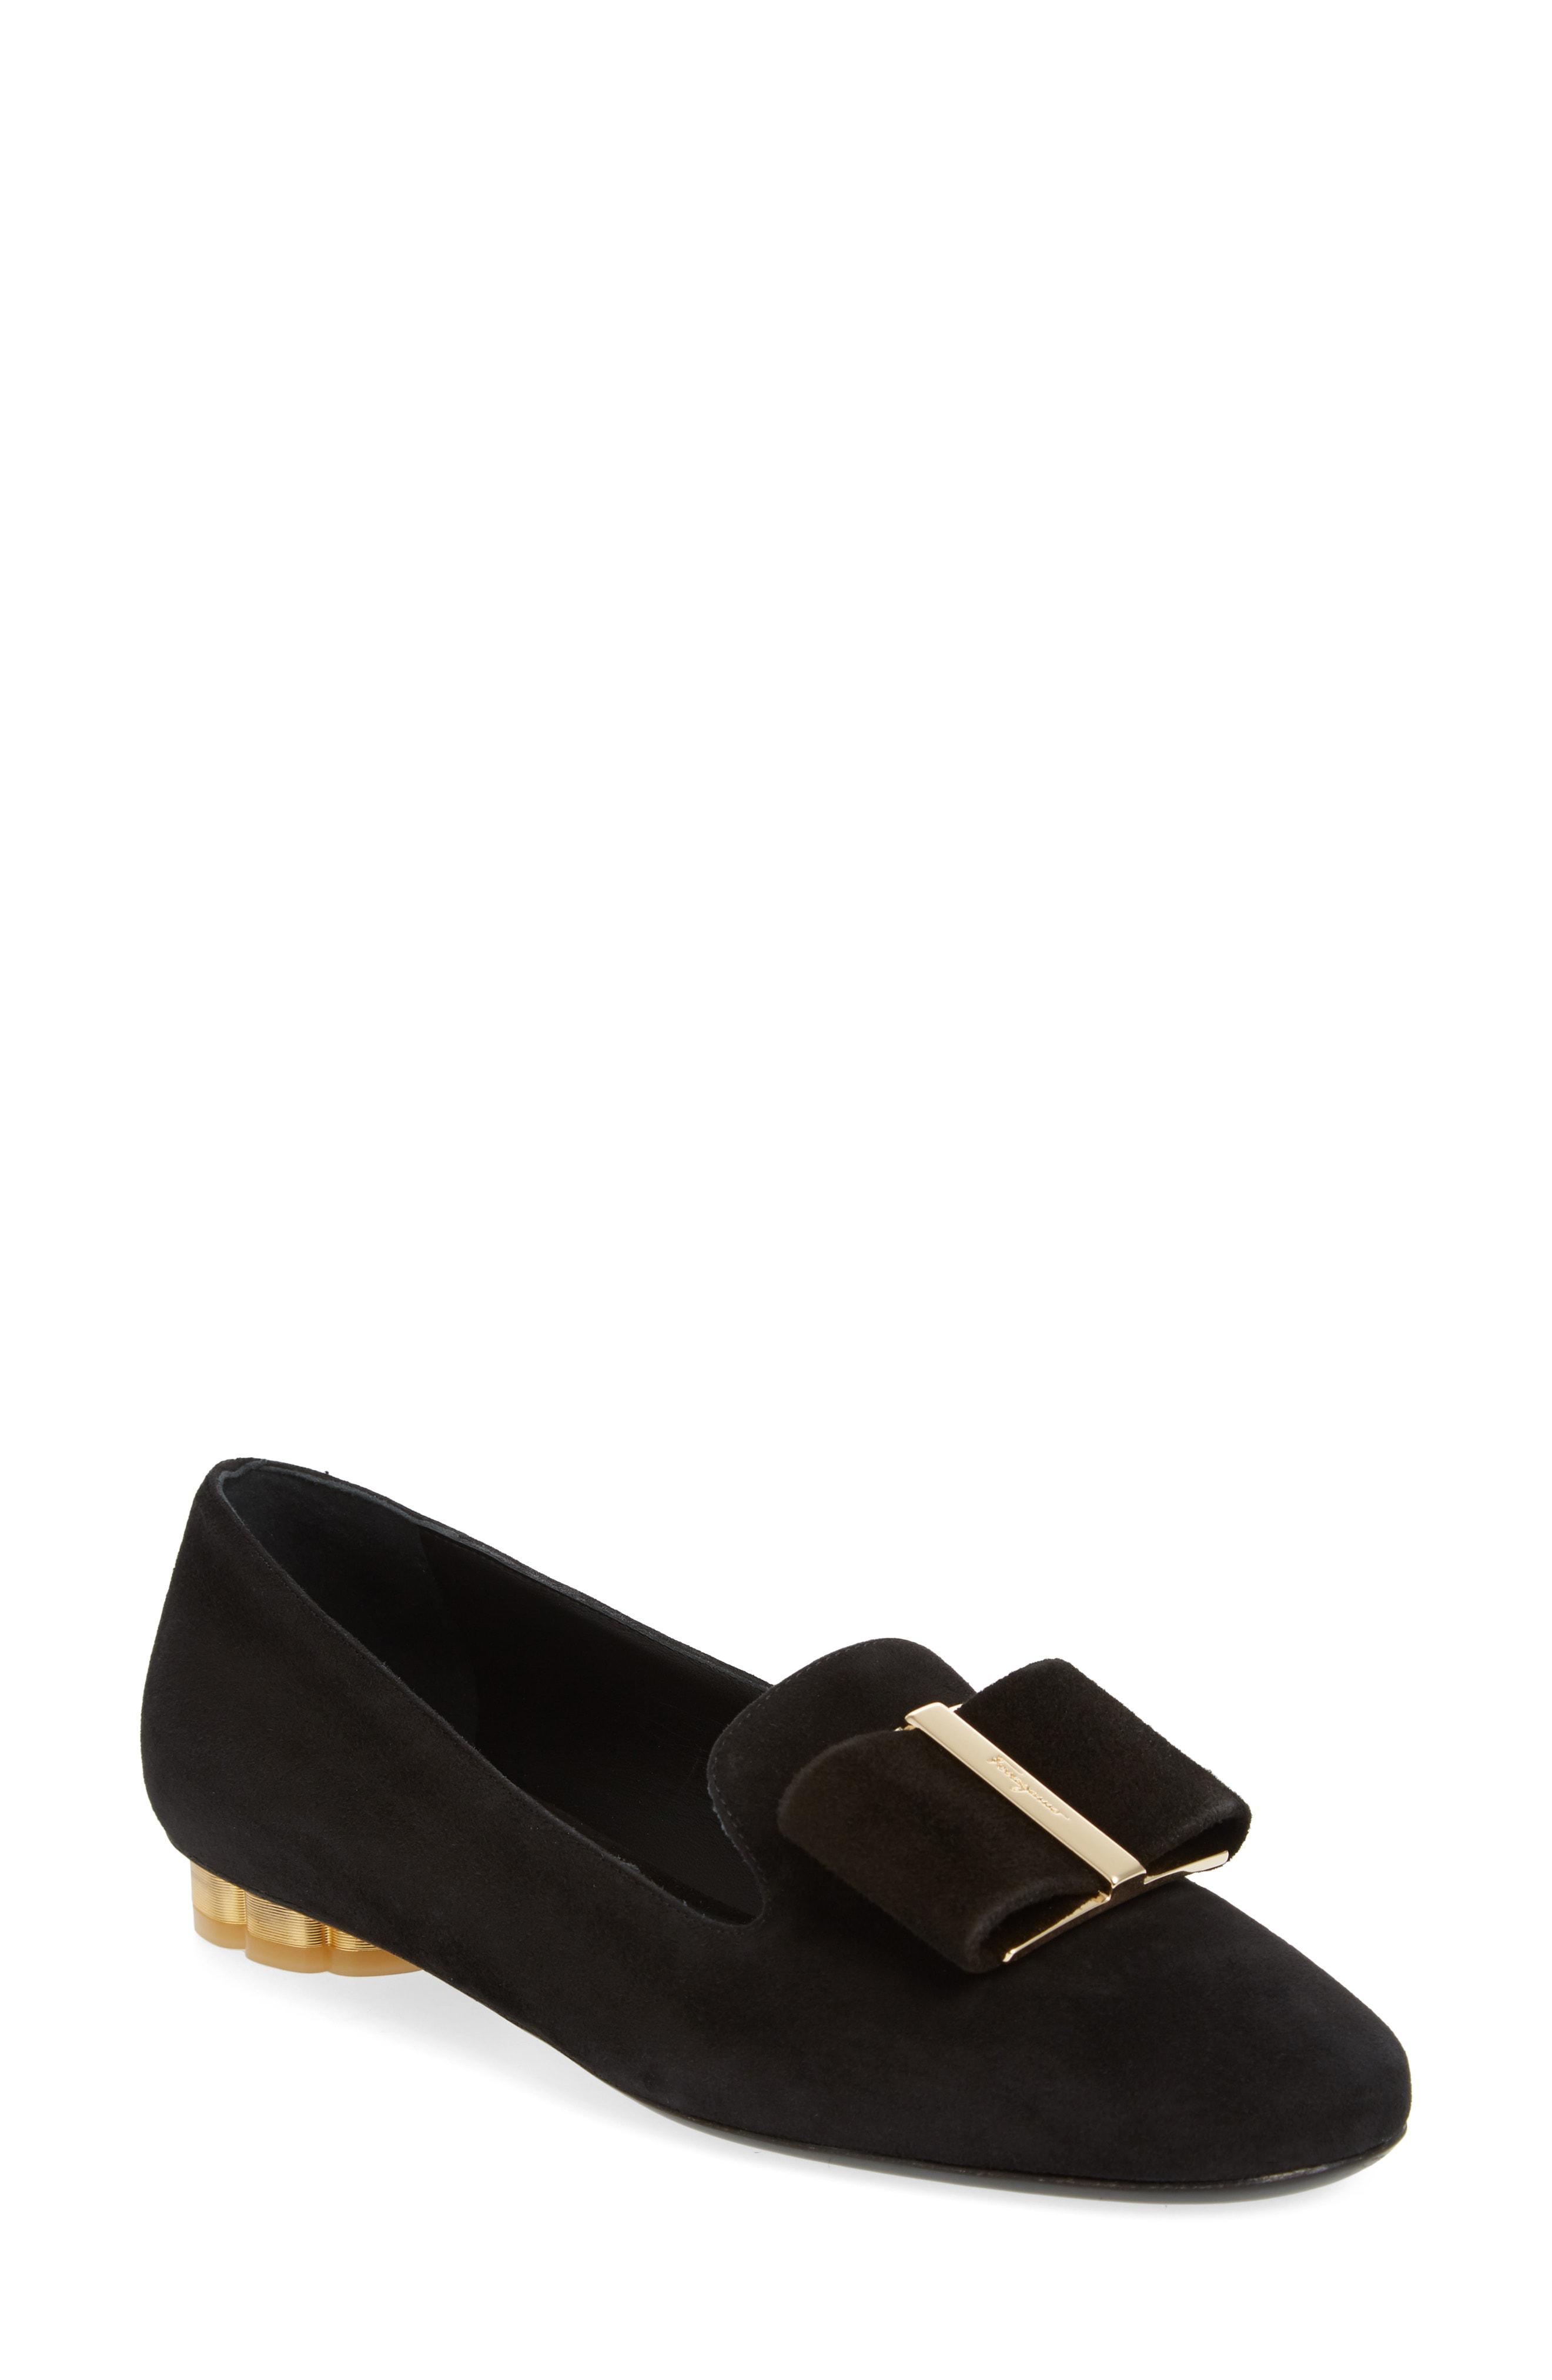 6d6d05c1fa4 Salvatore Ferragamo  Sarno  Metallic Flower Heel Bow Velvet Loafers ...